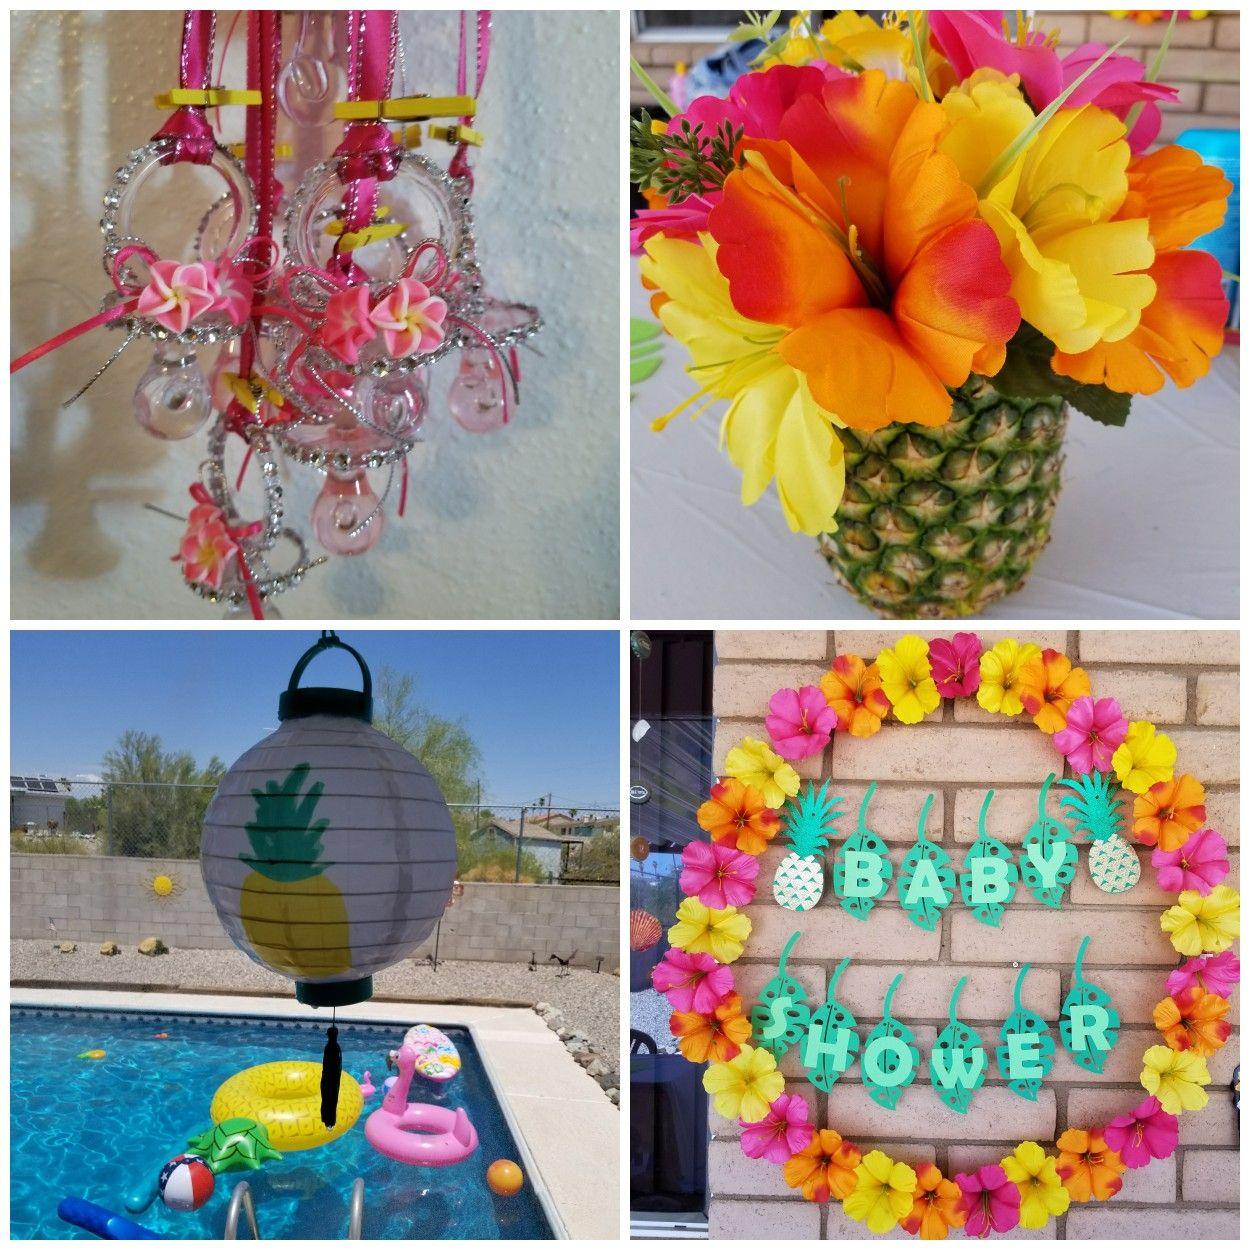 Luau Baby Shower   Hawaiian Baby Shower   Summer Baby Shower   Pool Party Baby  Shower